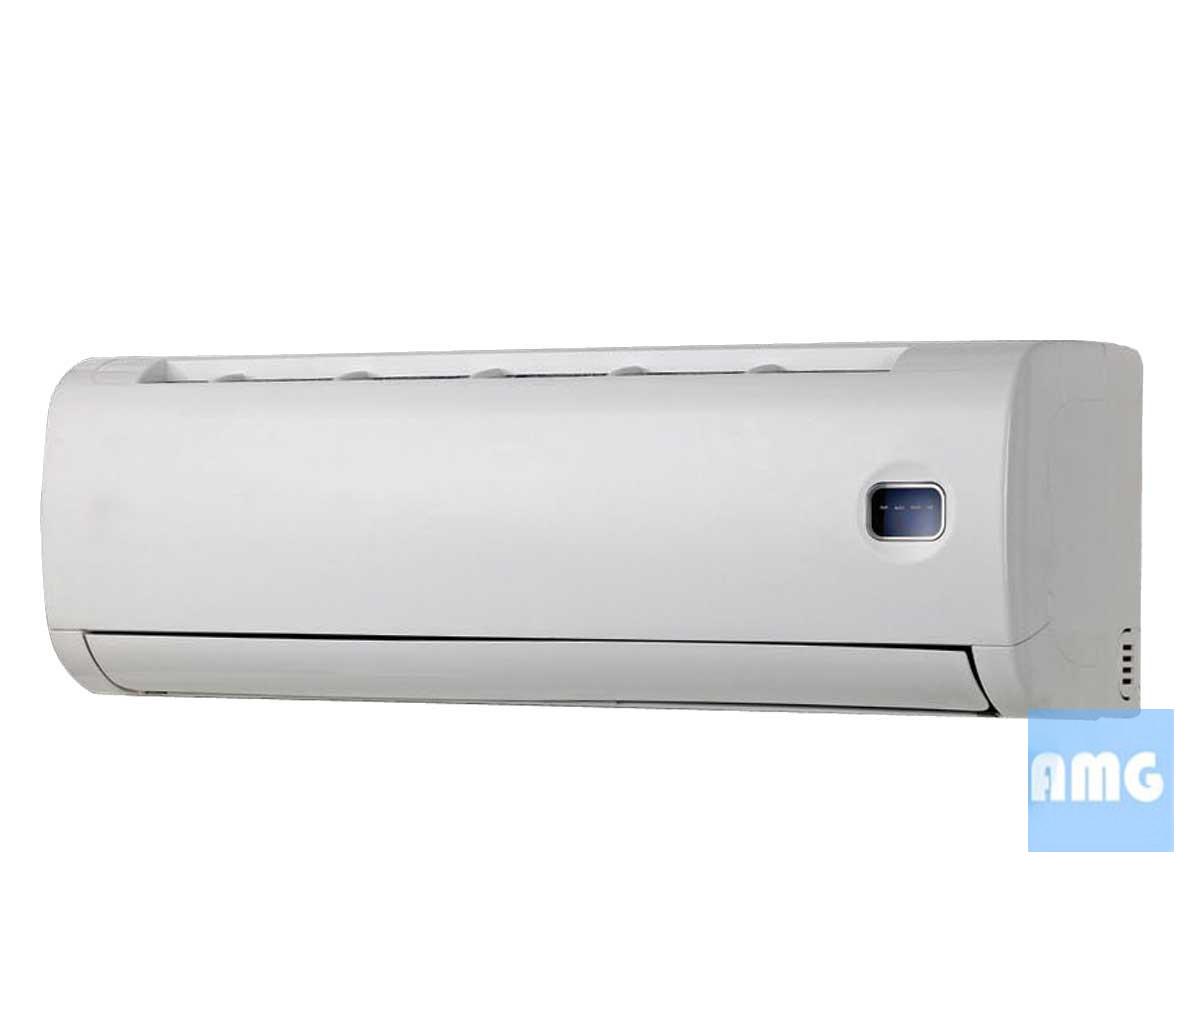 wiring diagram ac split daikin inverter nissan almera ductless | get free image about